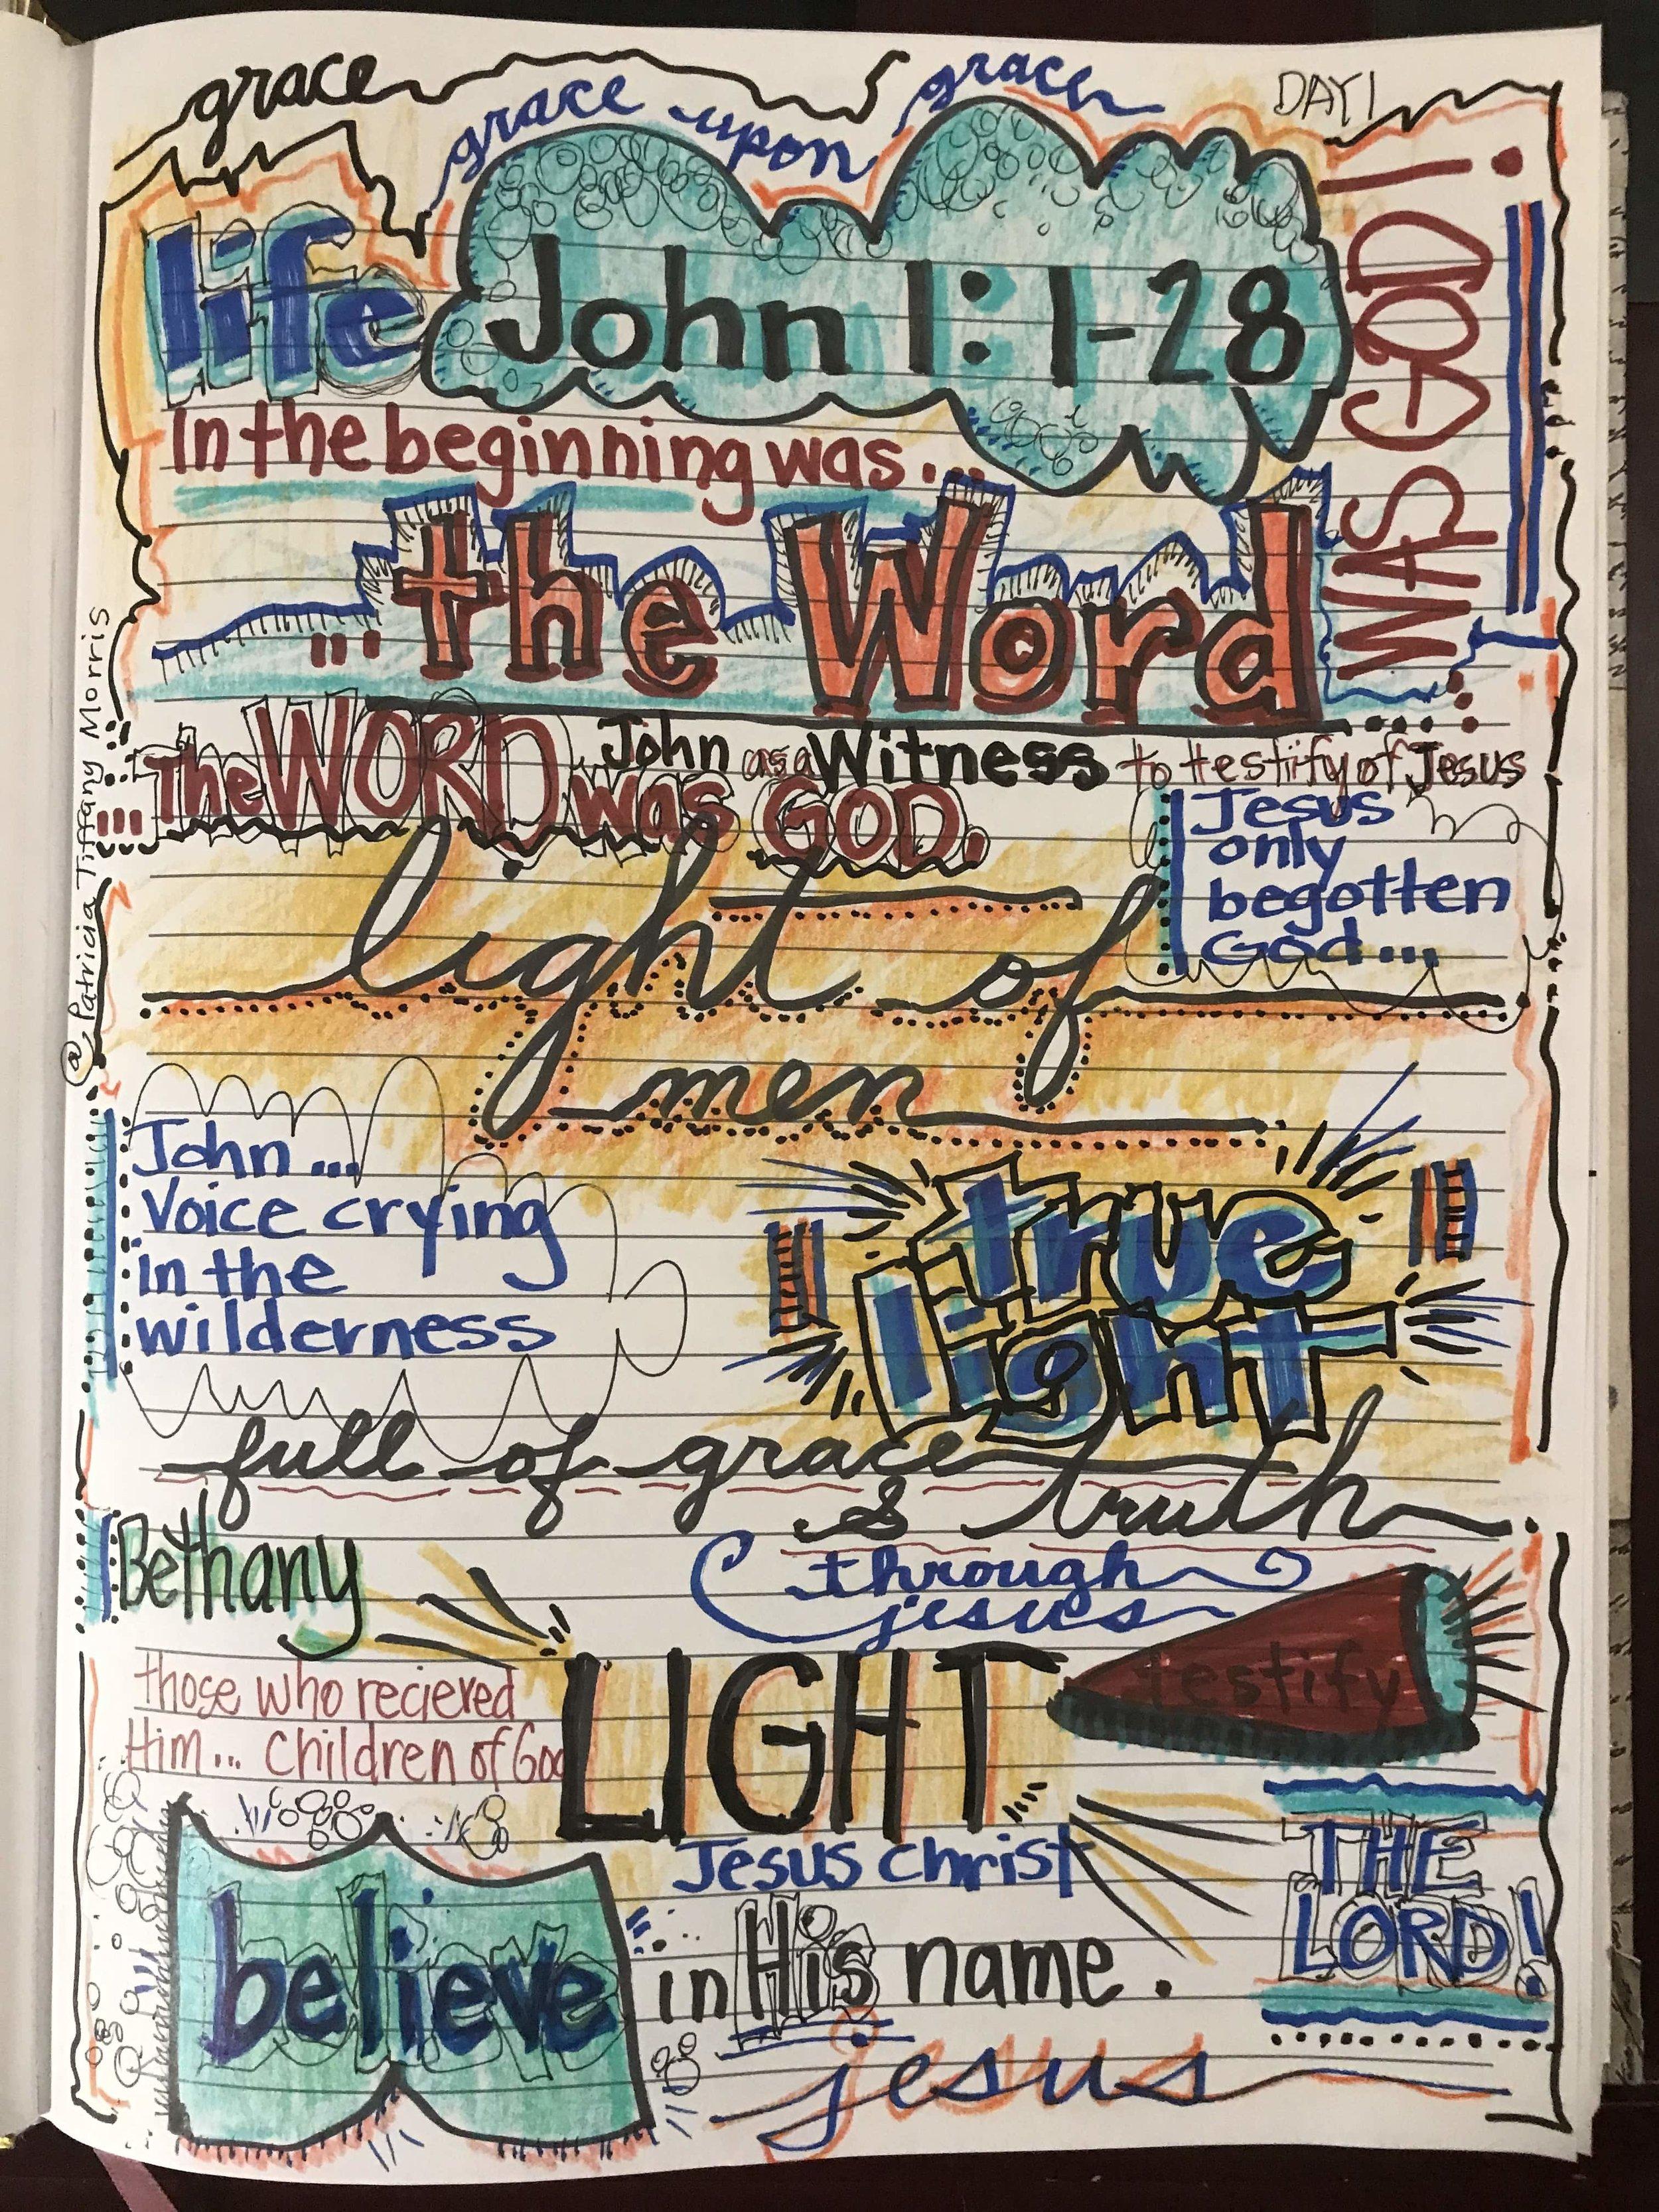 #precepts #Biblestudy #gospelofjohn #jesusjournaljunkies #wordofgod #sonofgod #graceupongrace